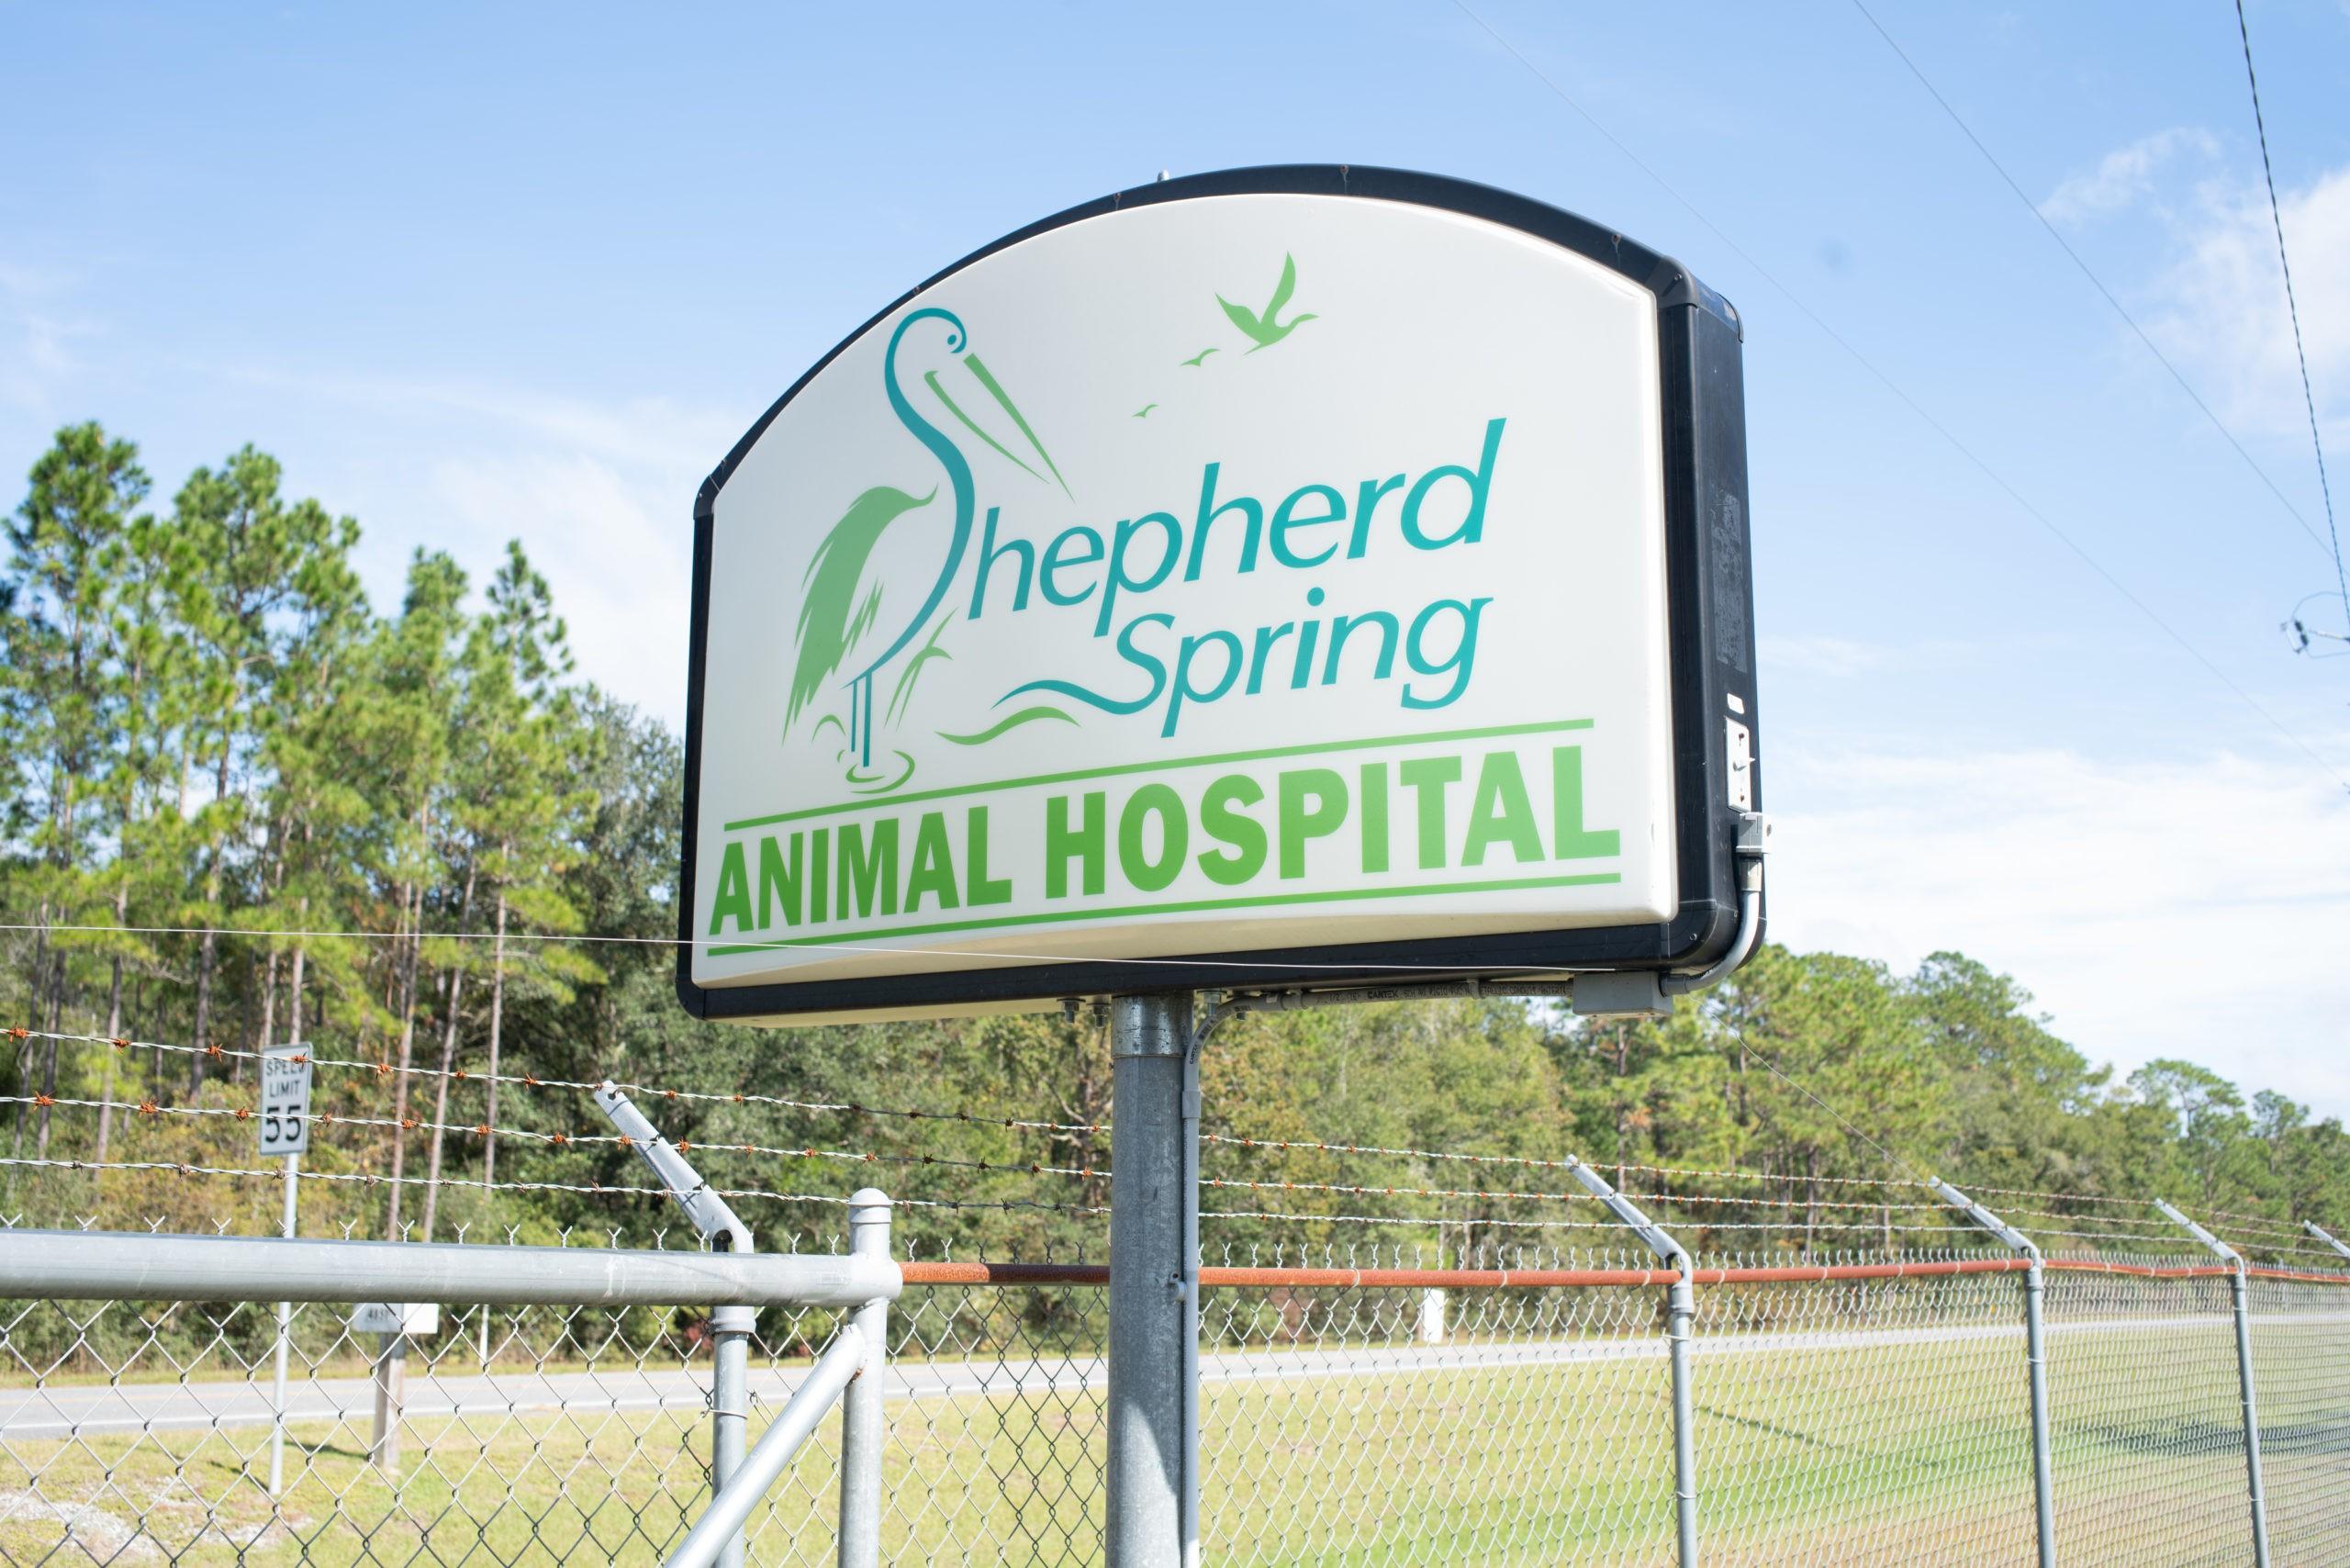 Animal Hospital Image